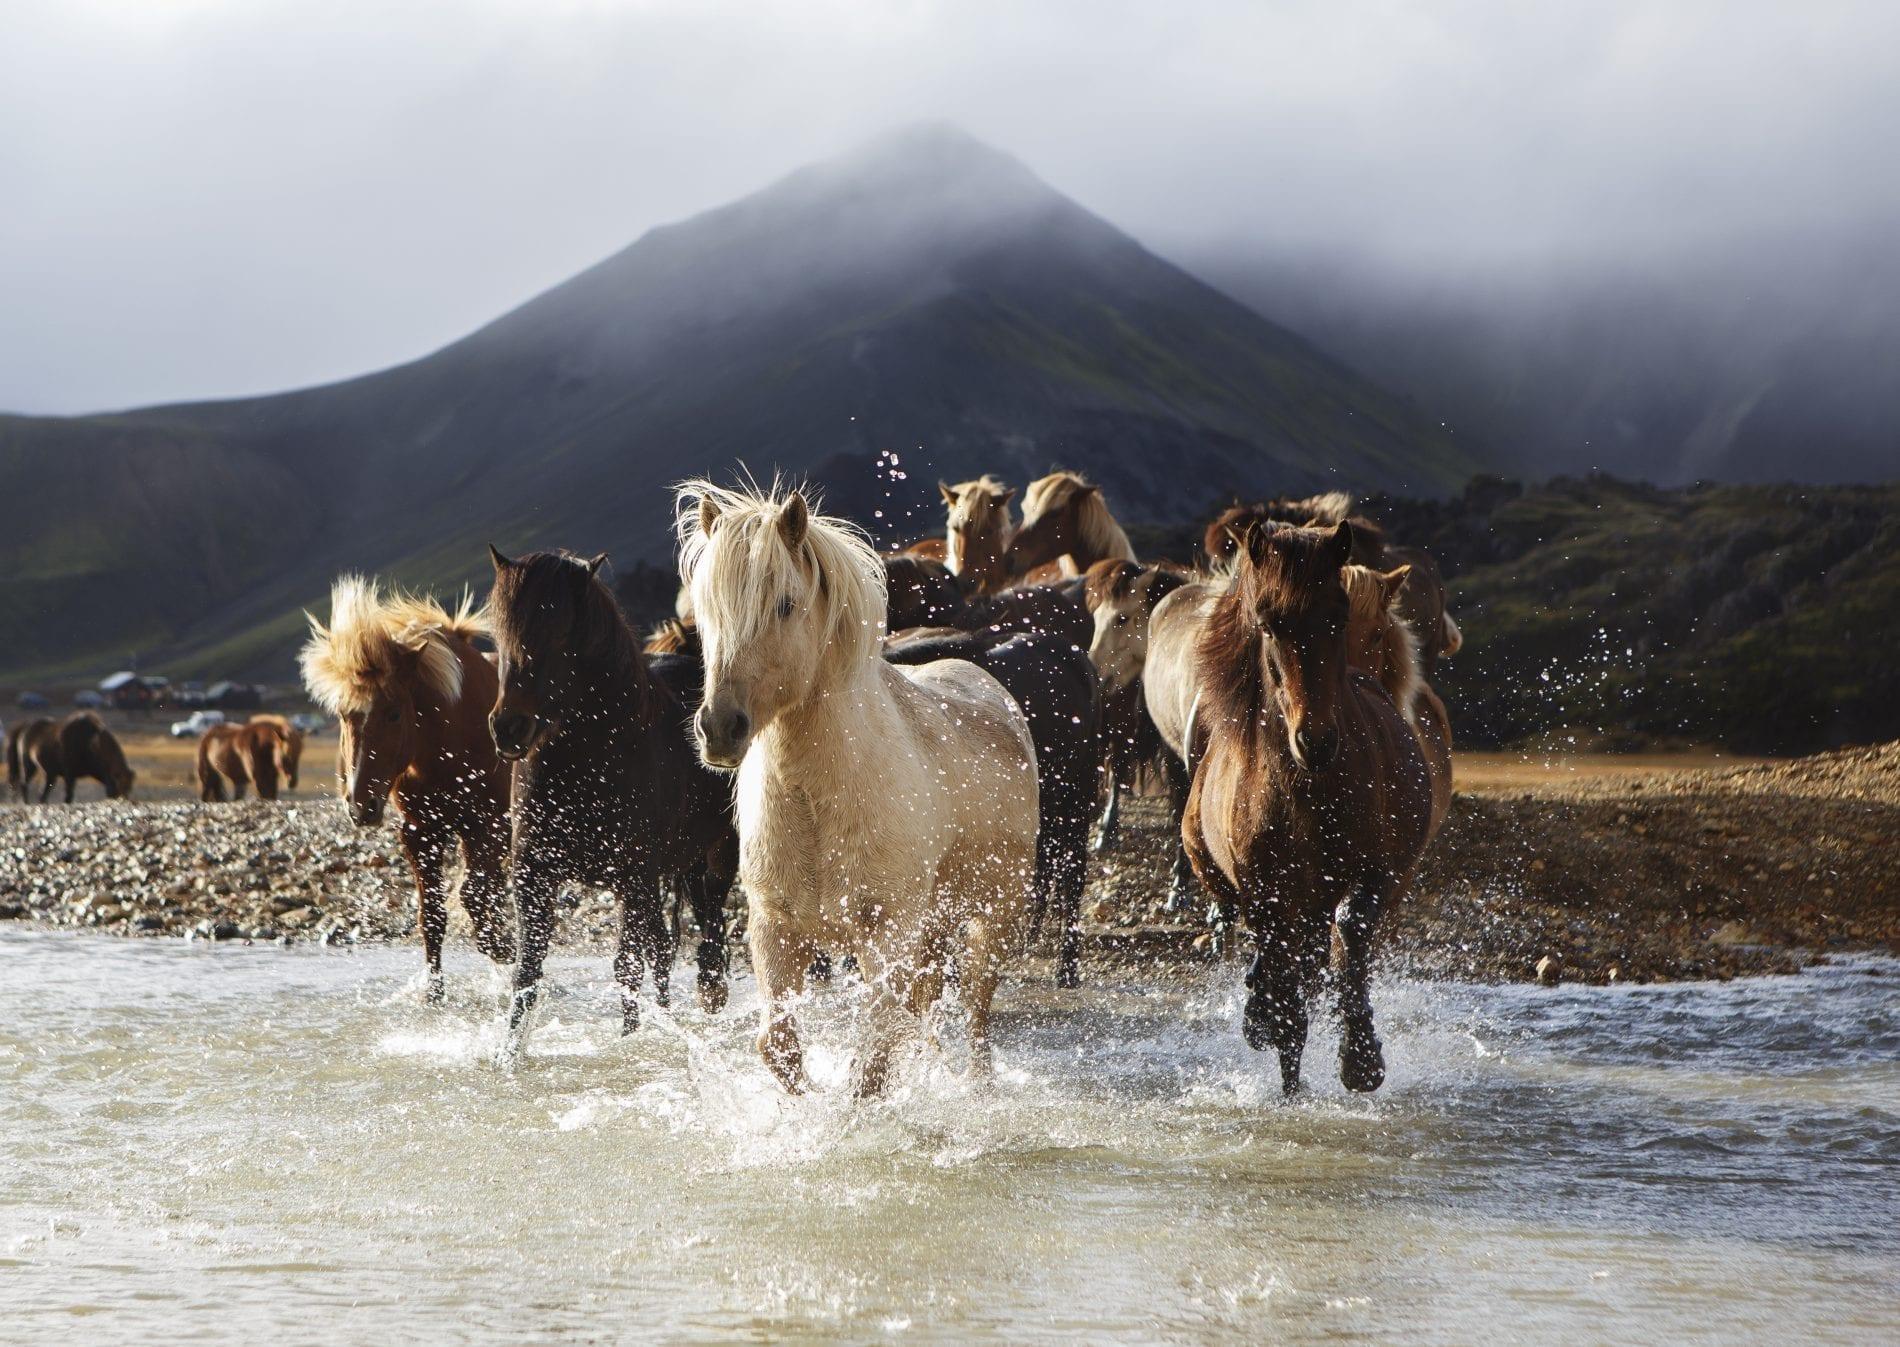 Horses crossing the river by Landmannalaugar